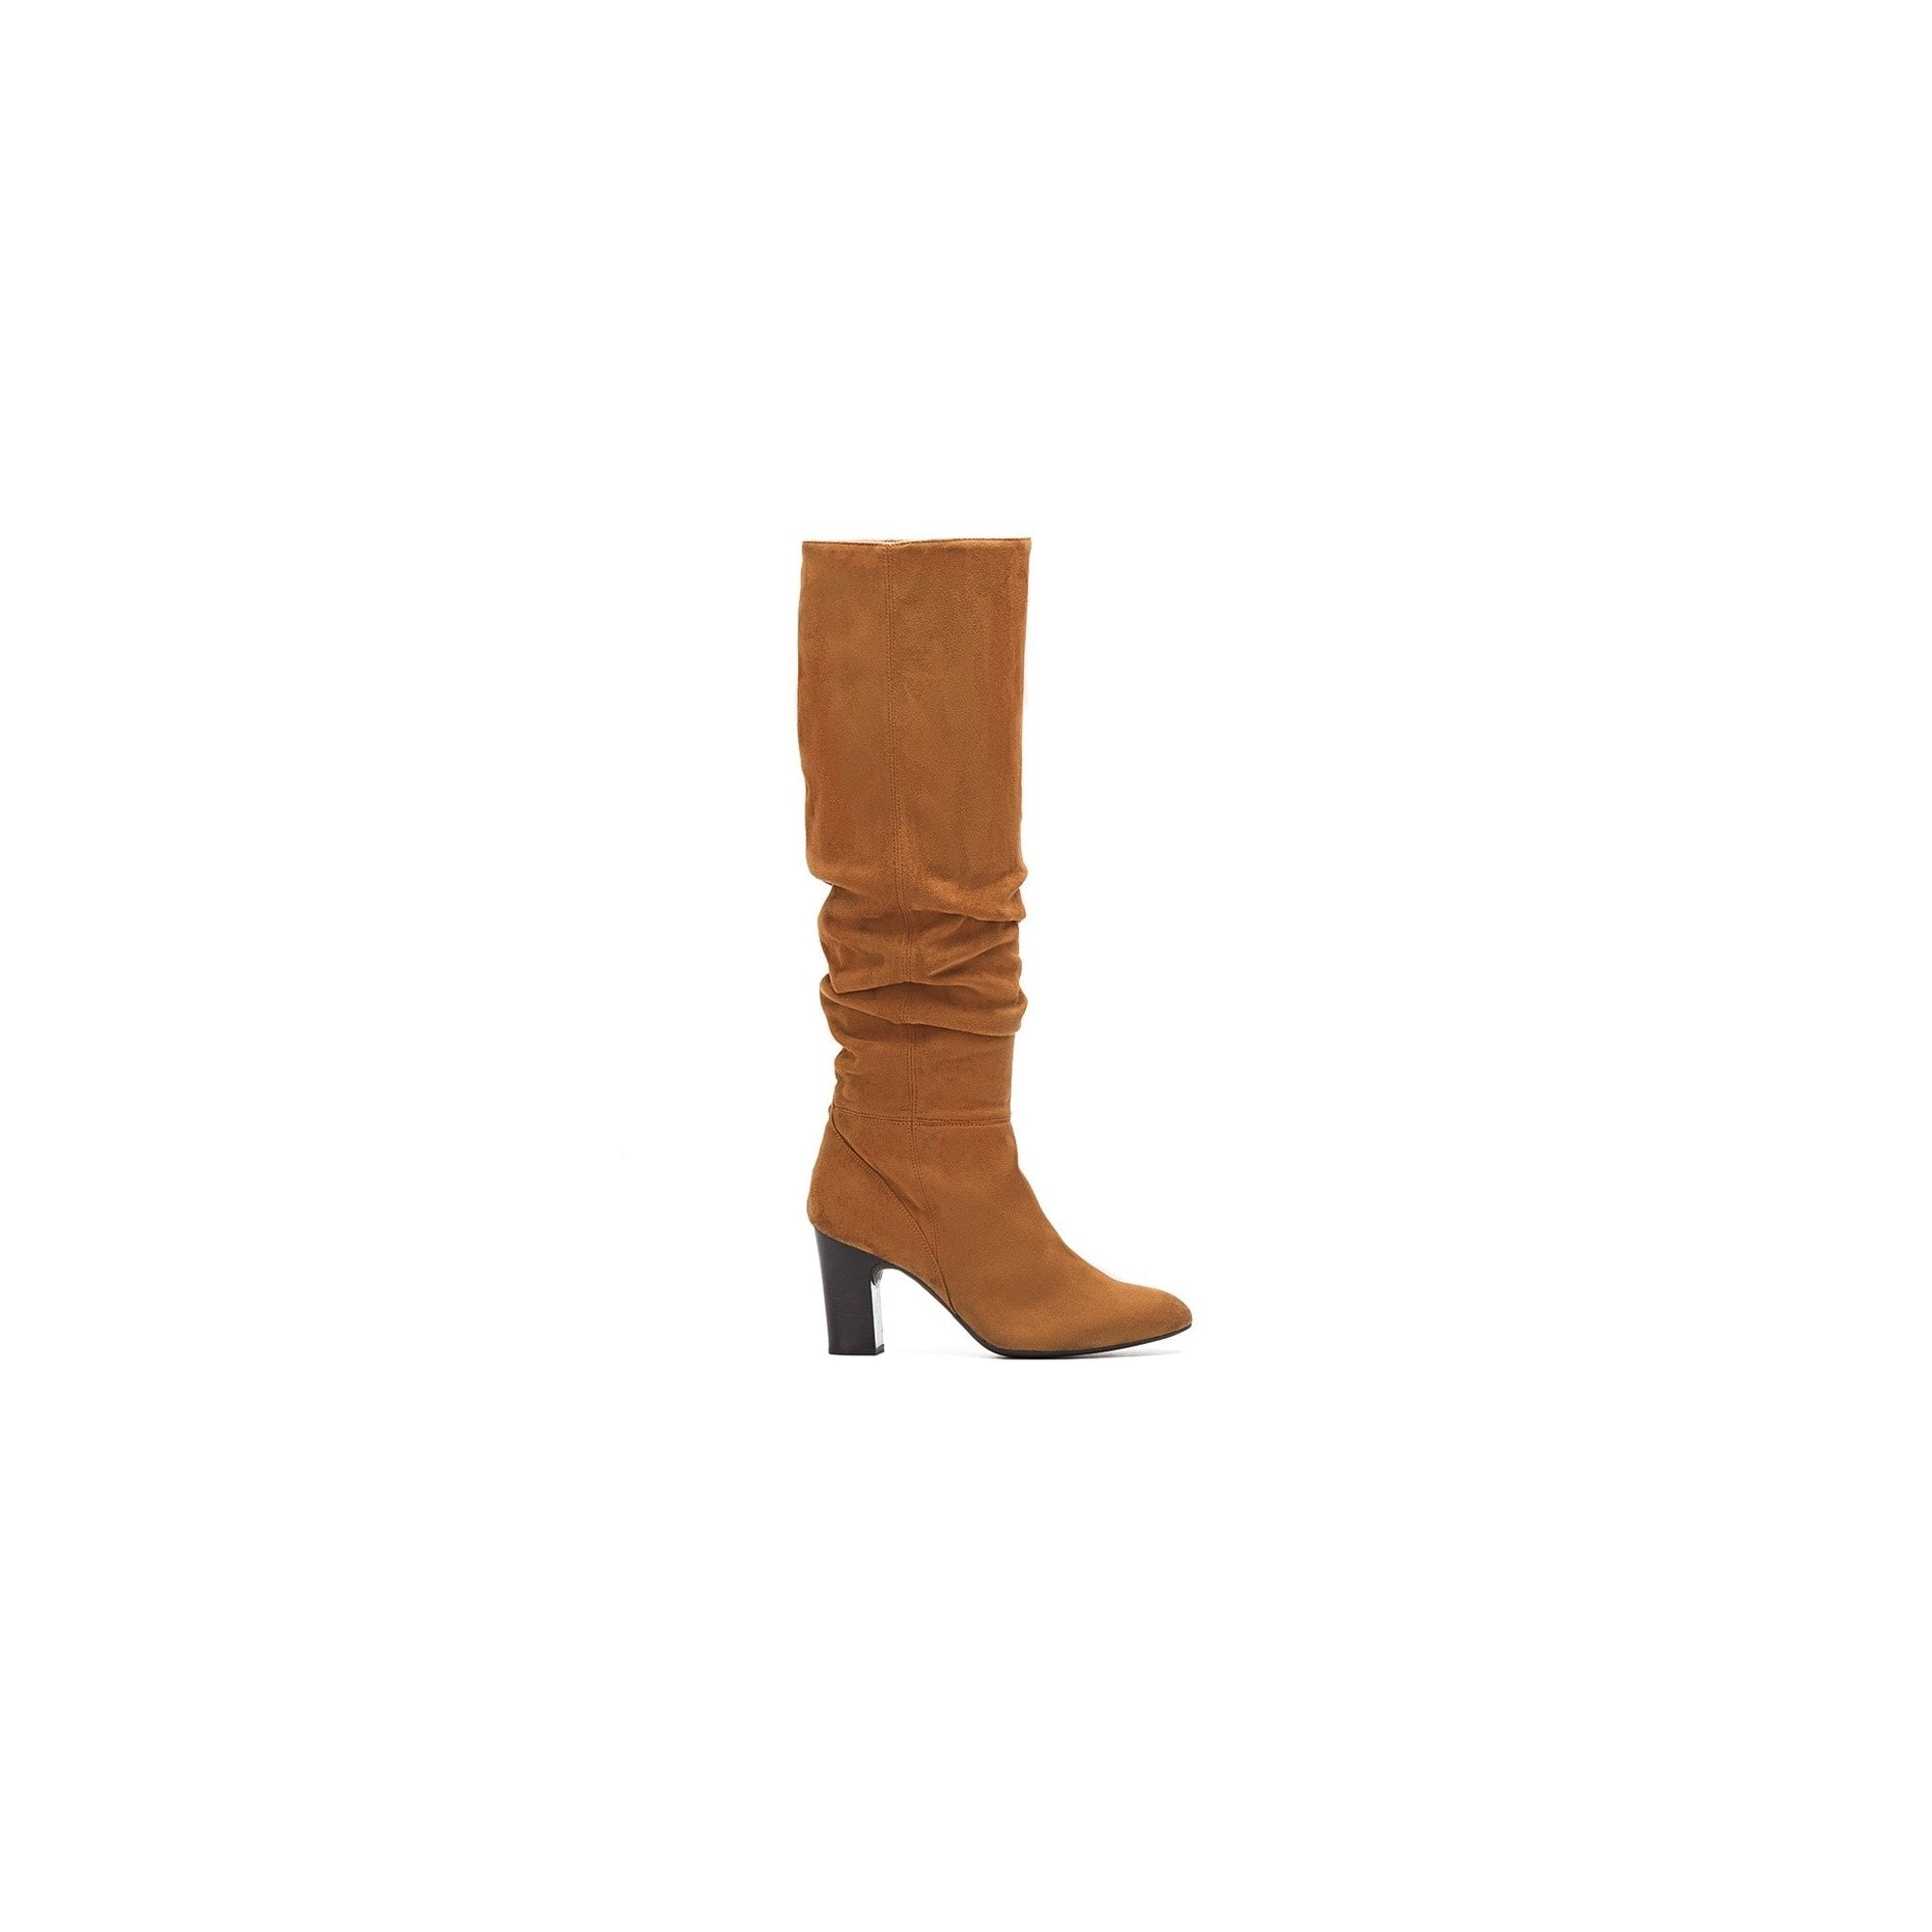 Unisa URICA Over the knee boots